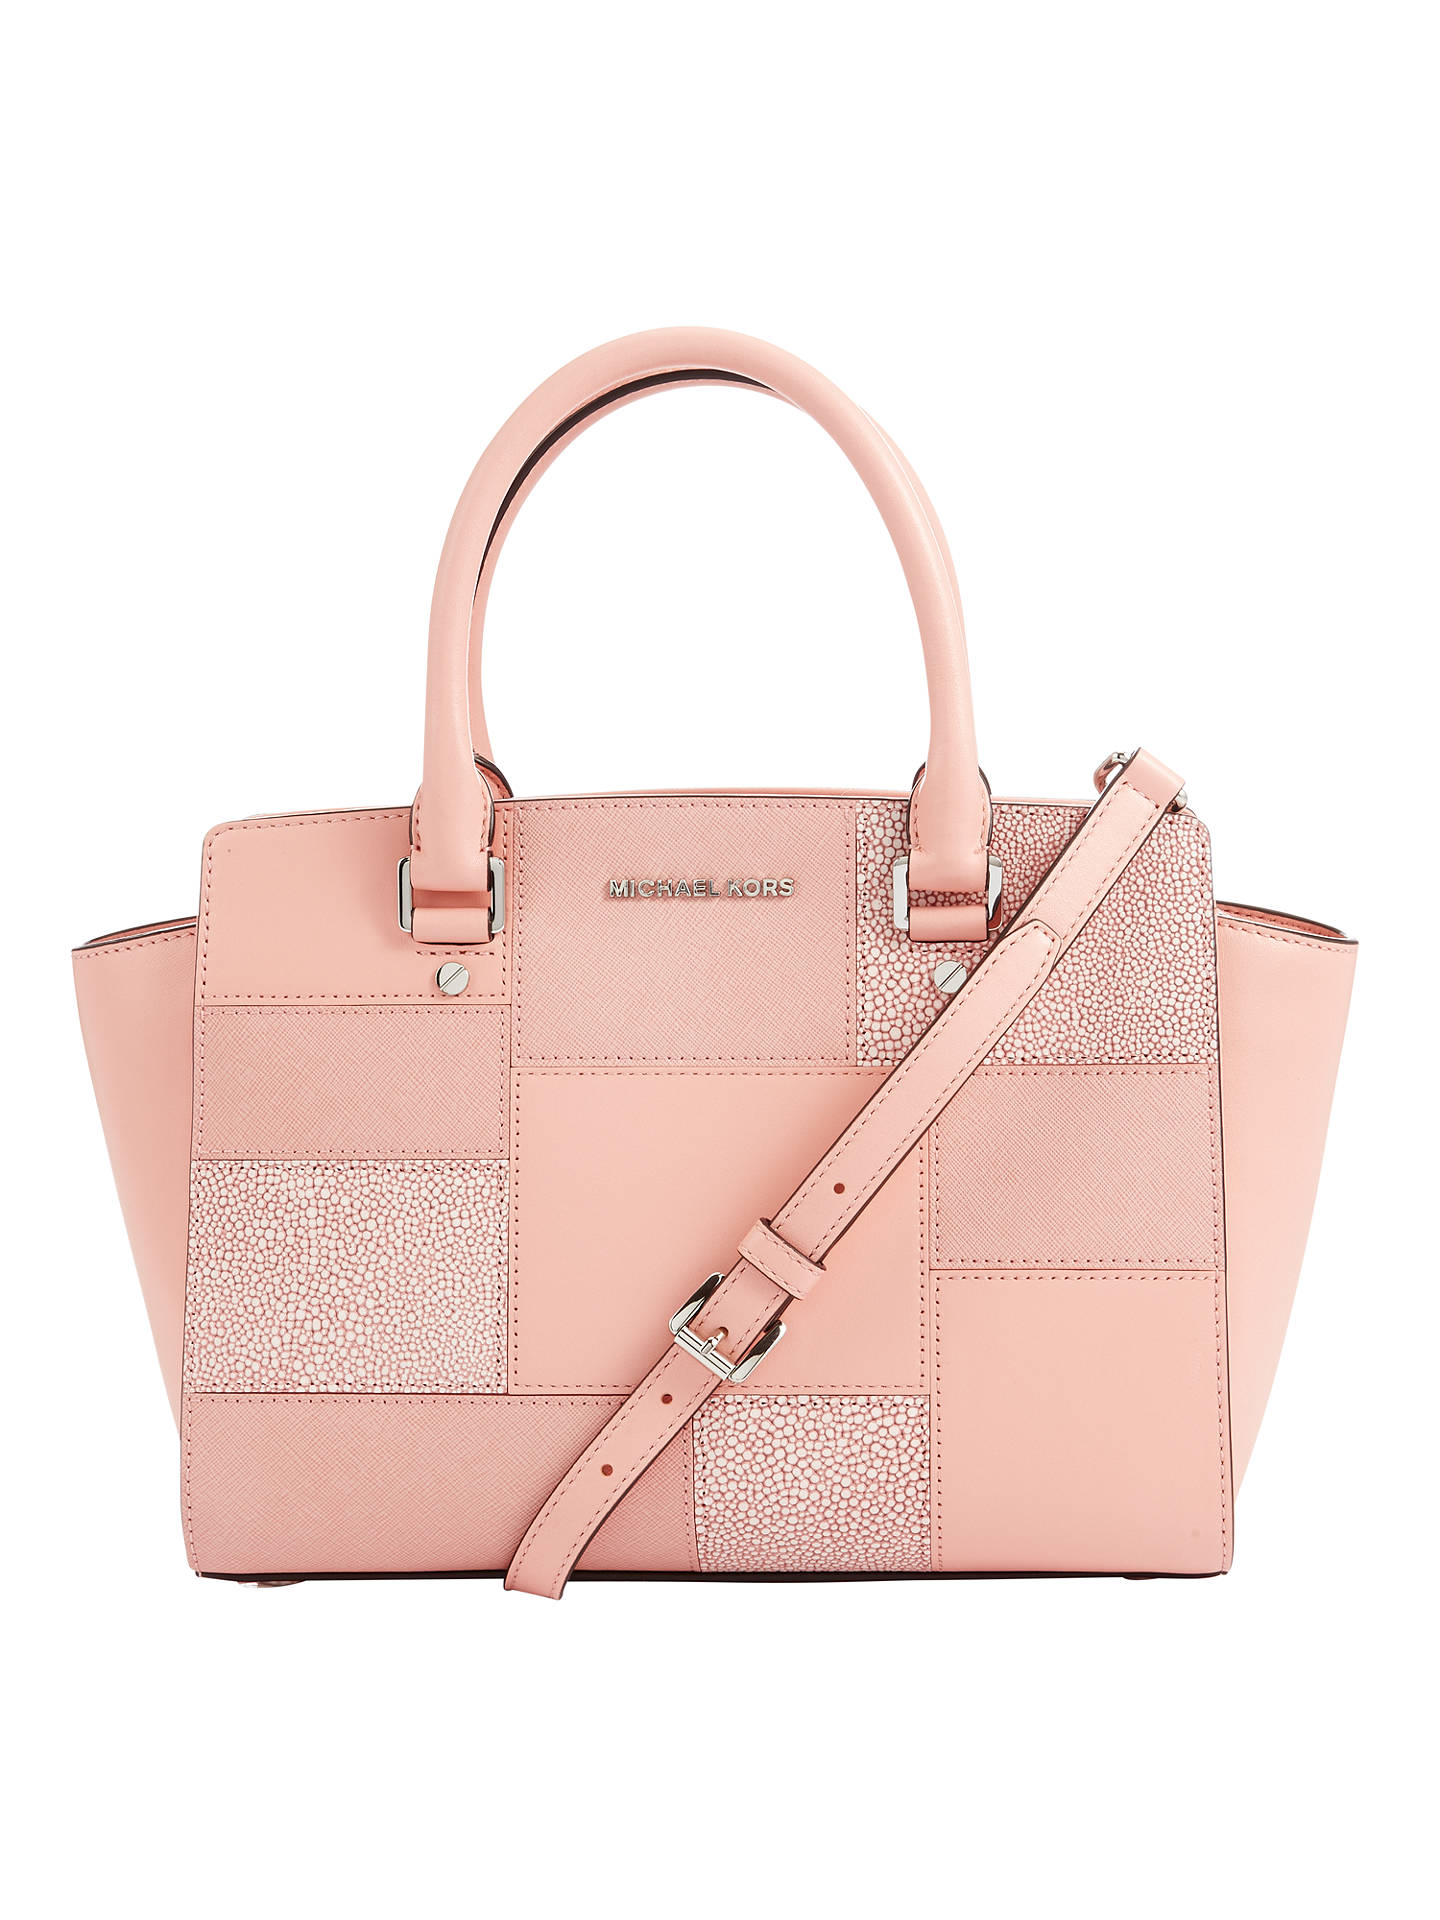 ef69a2f02327 Buy MICHAEL Michael Kors Selma Medium Leather Satchel, Pink Online at  johnlewis.com ...